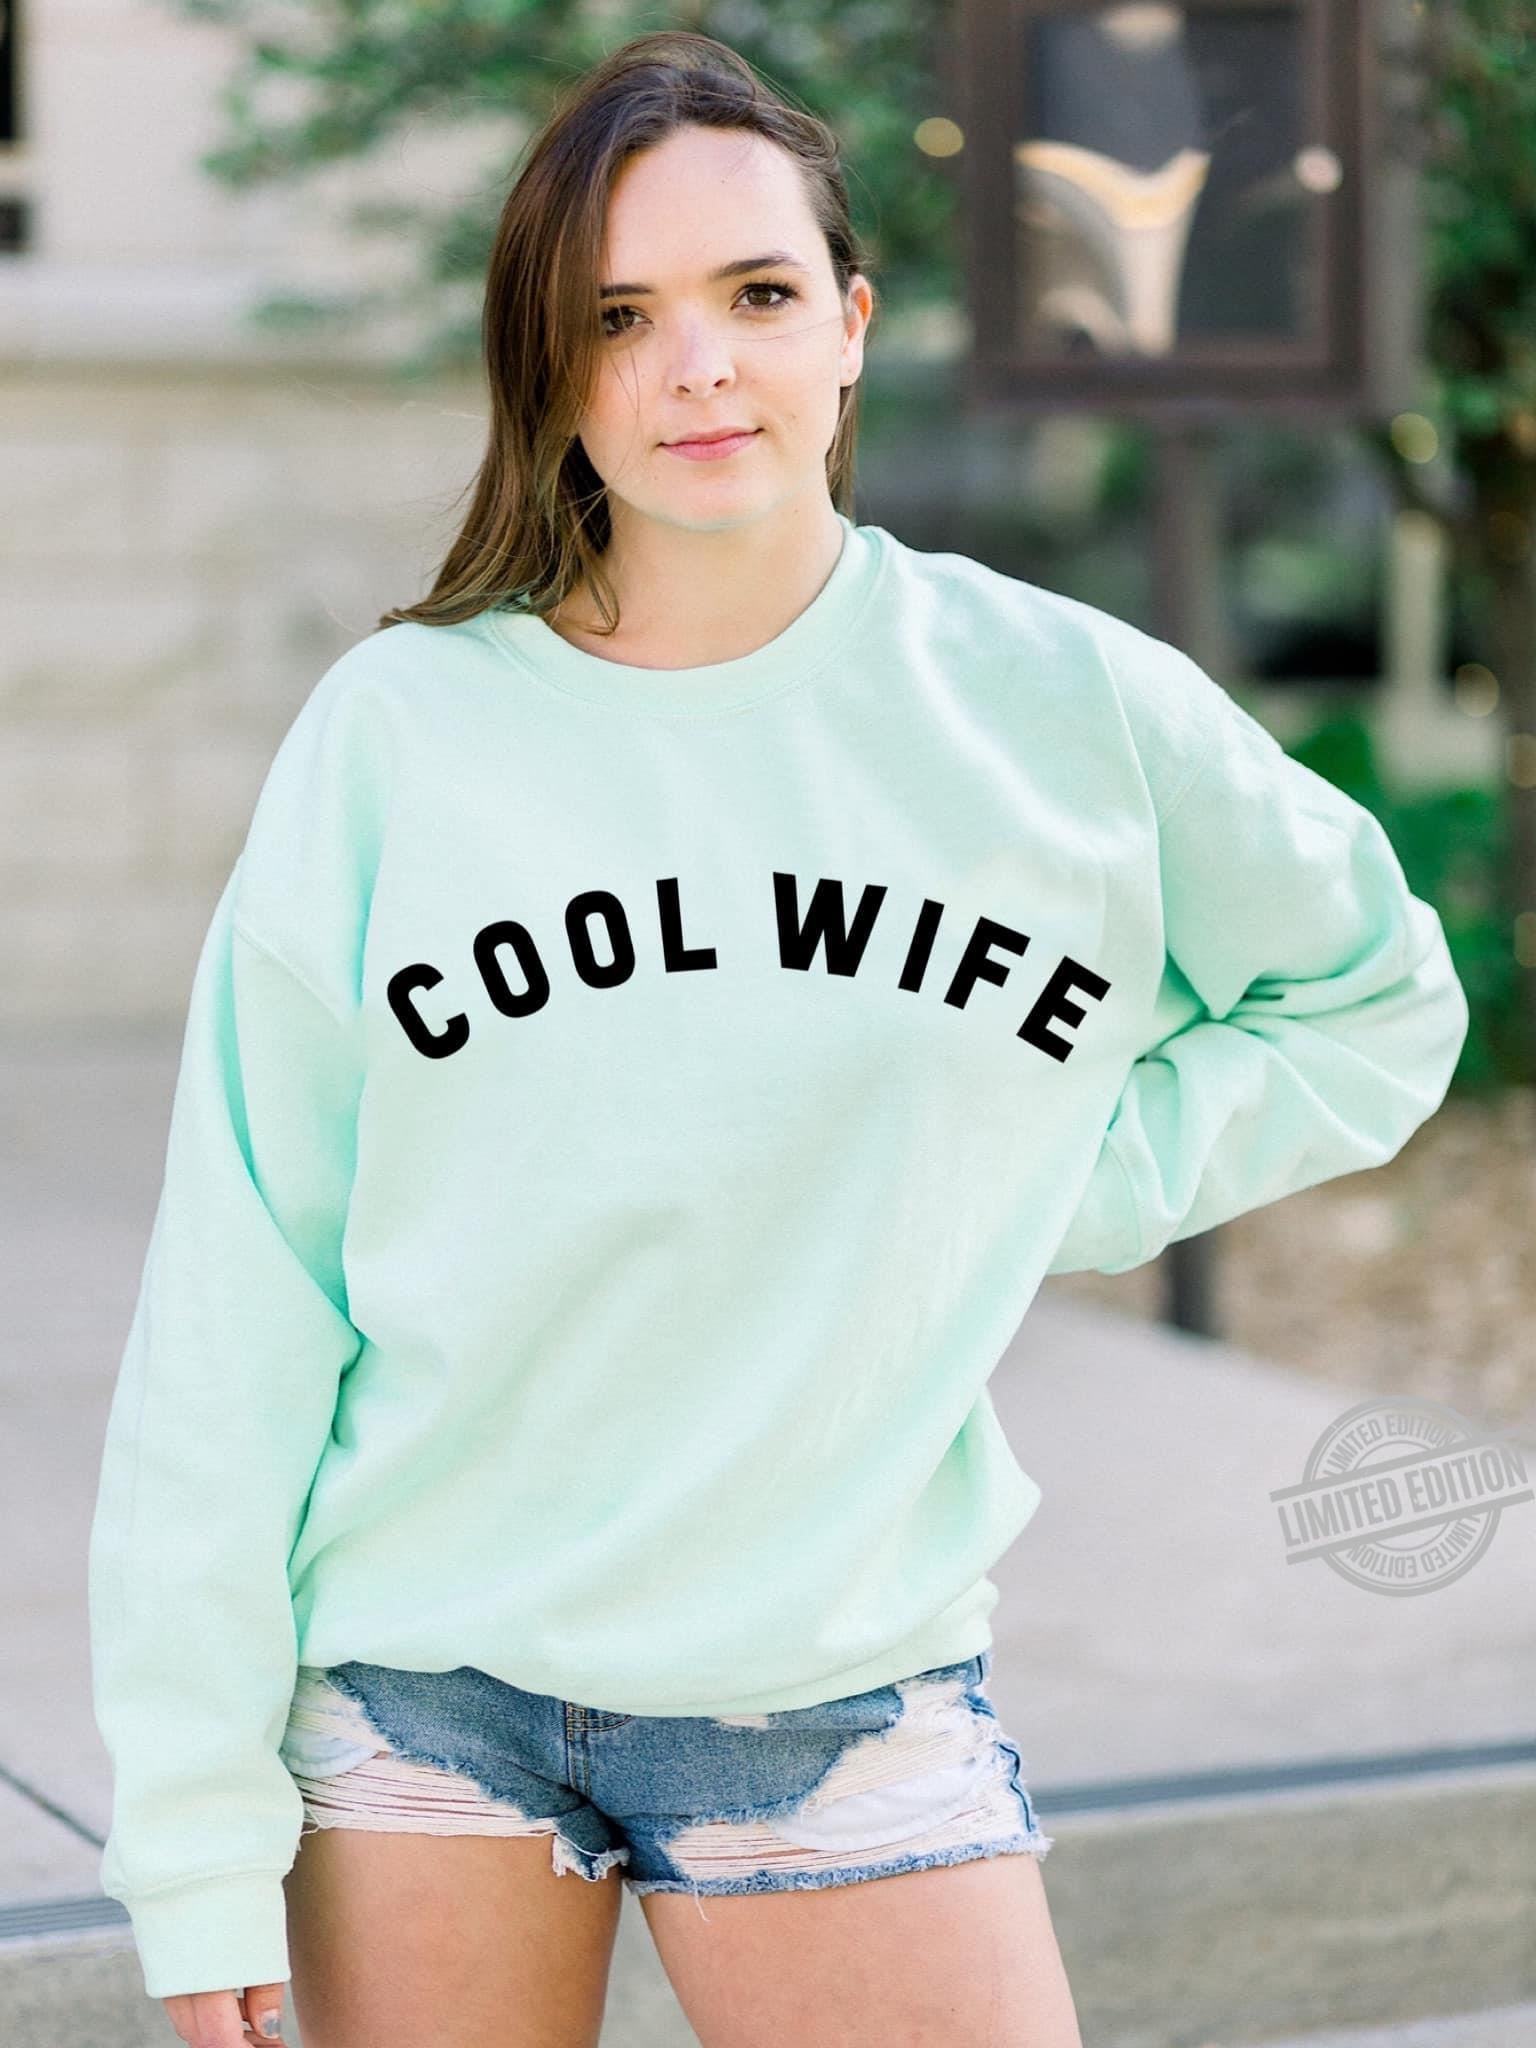 Cool Wife Shirt